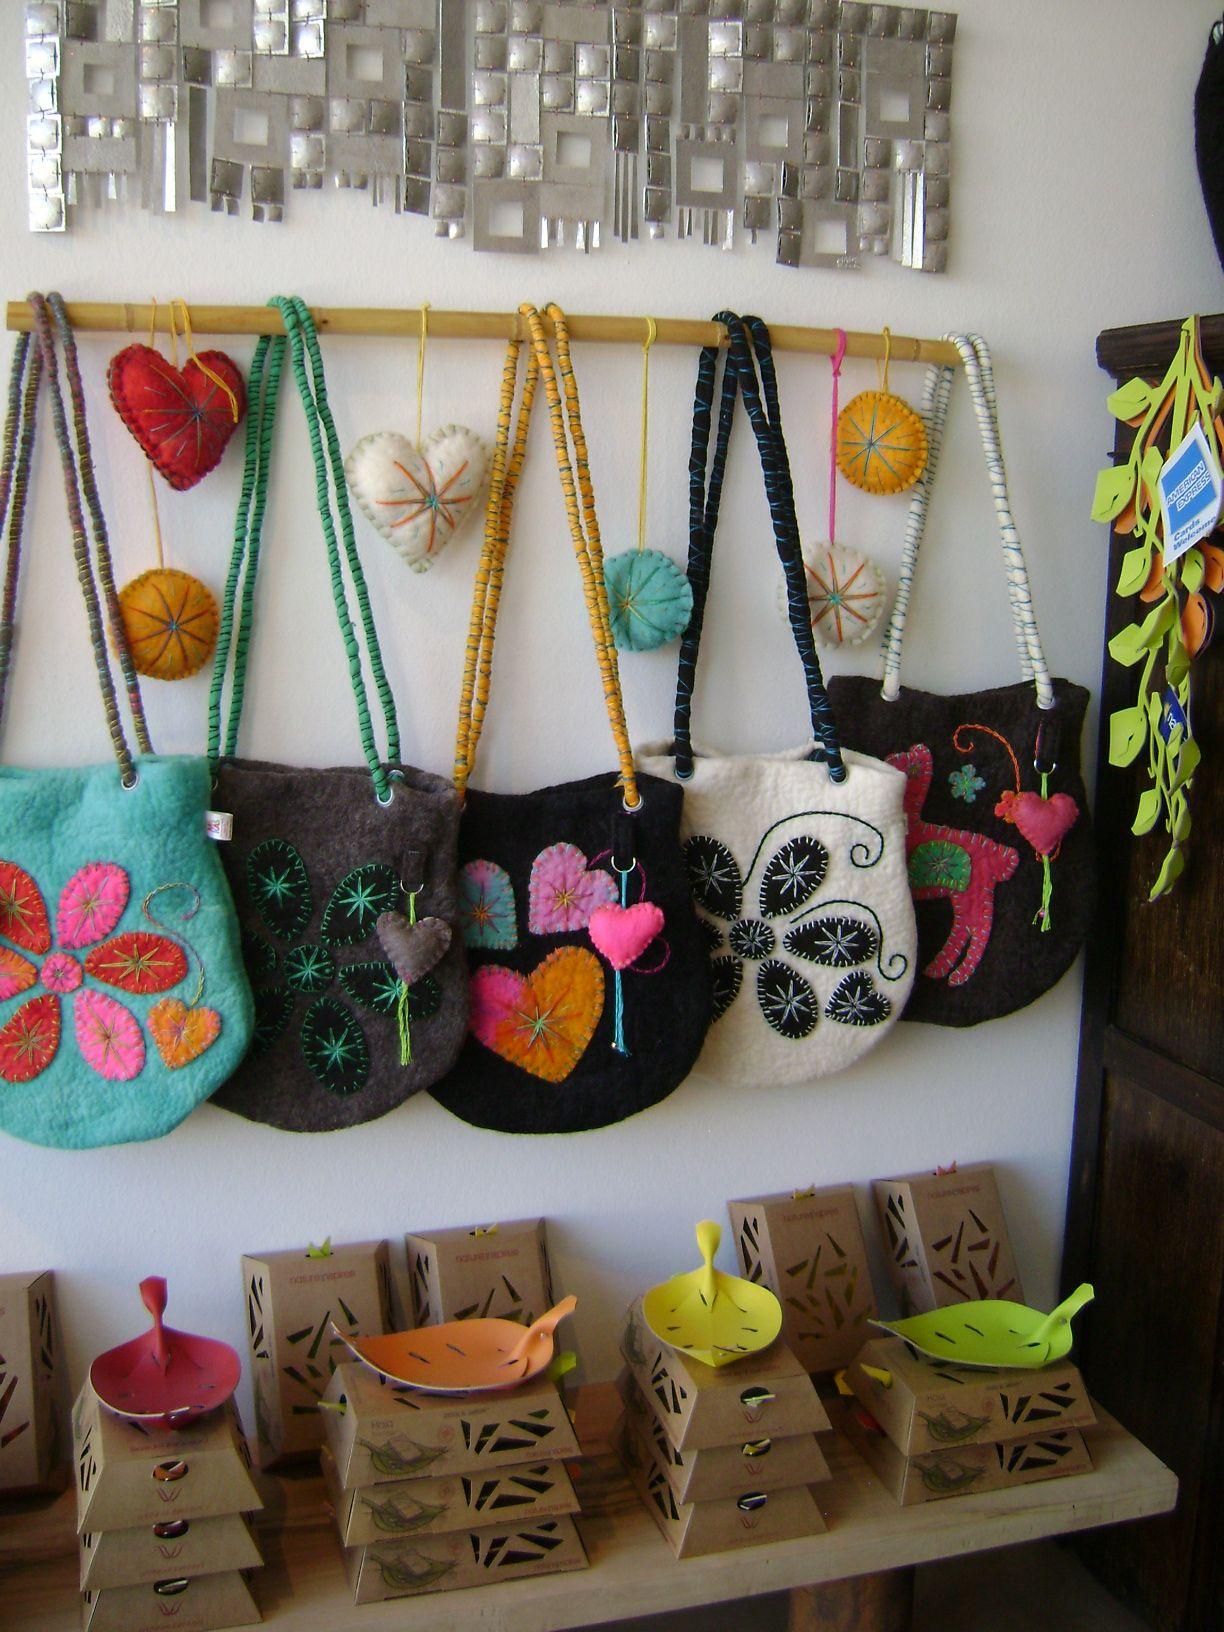 Trama dise o artesanal tienda de objetos de dise o - Objetos rusticos para decoracion ...